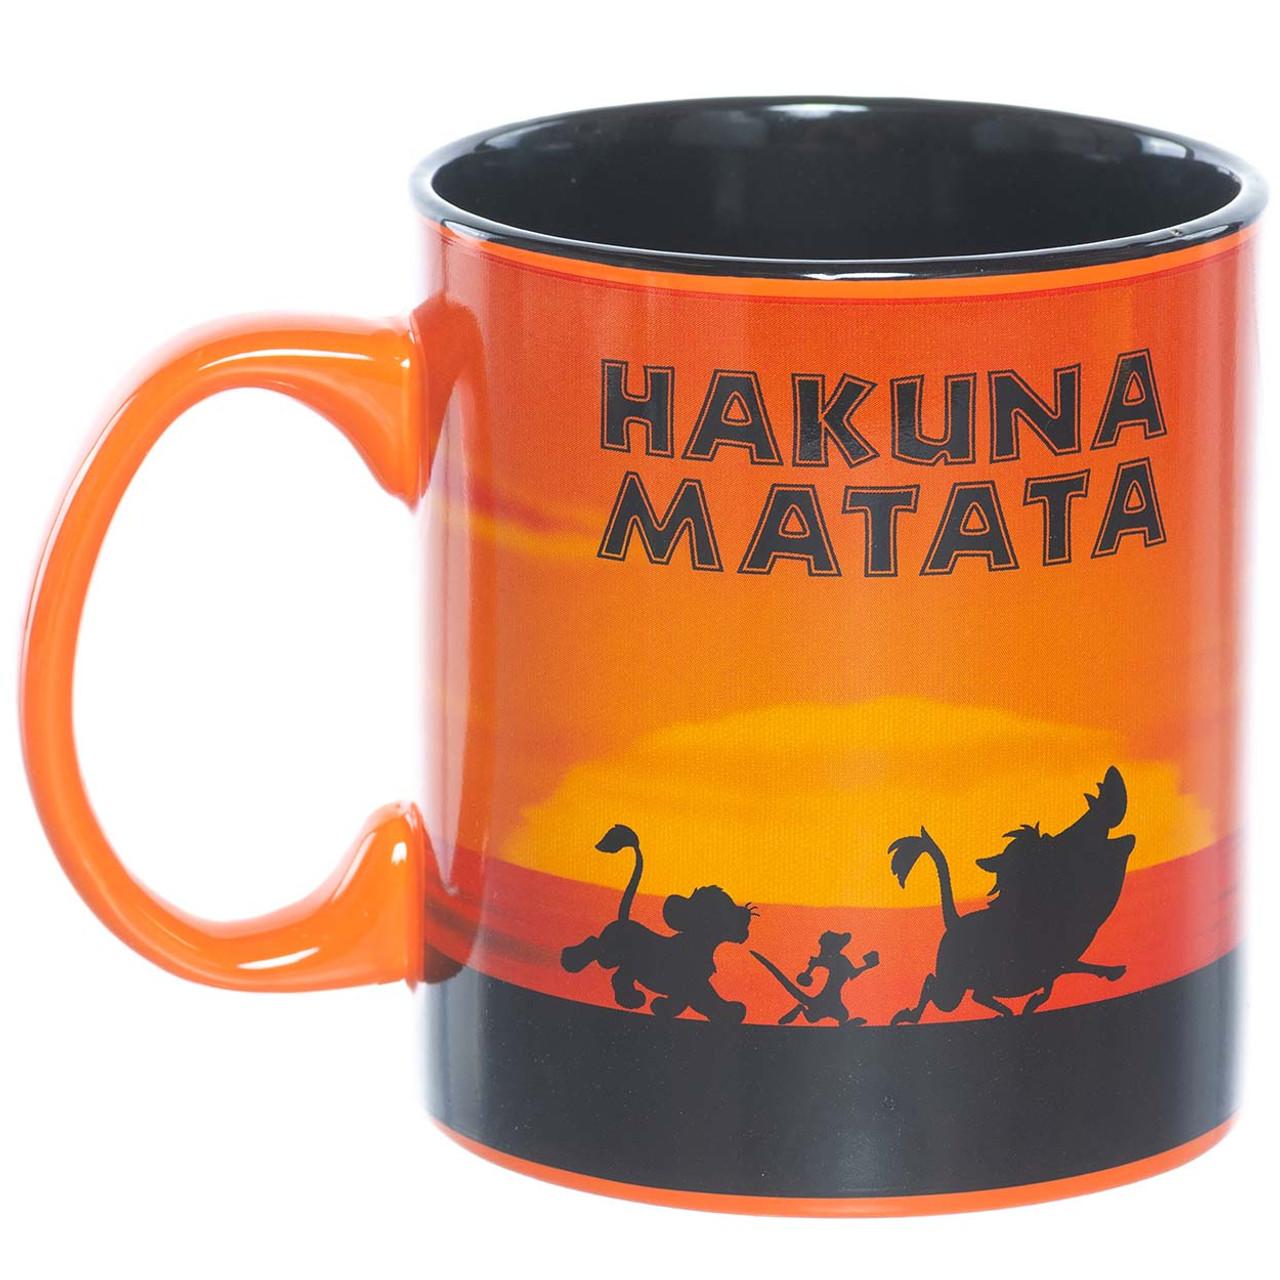 Disneys The Lion King Hakuna Matata Sunset 20 Oz Ceramic Mug By Silver Buffalo